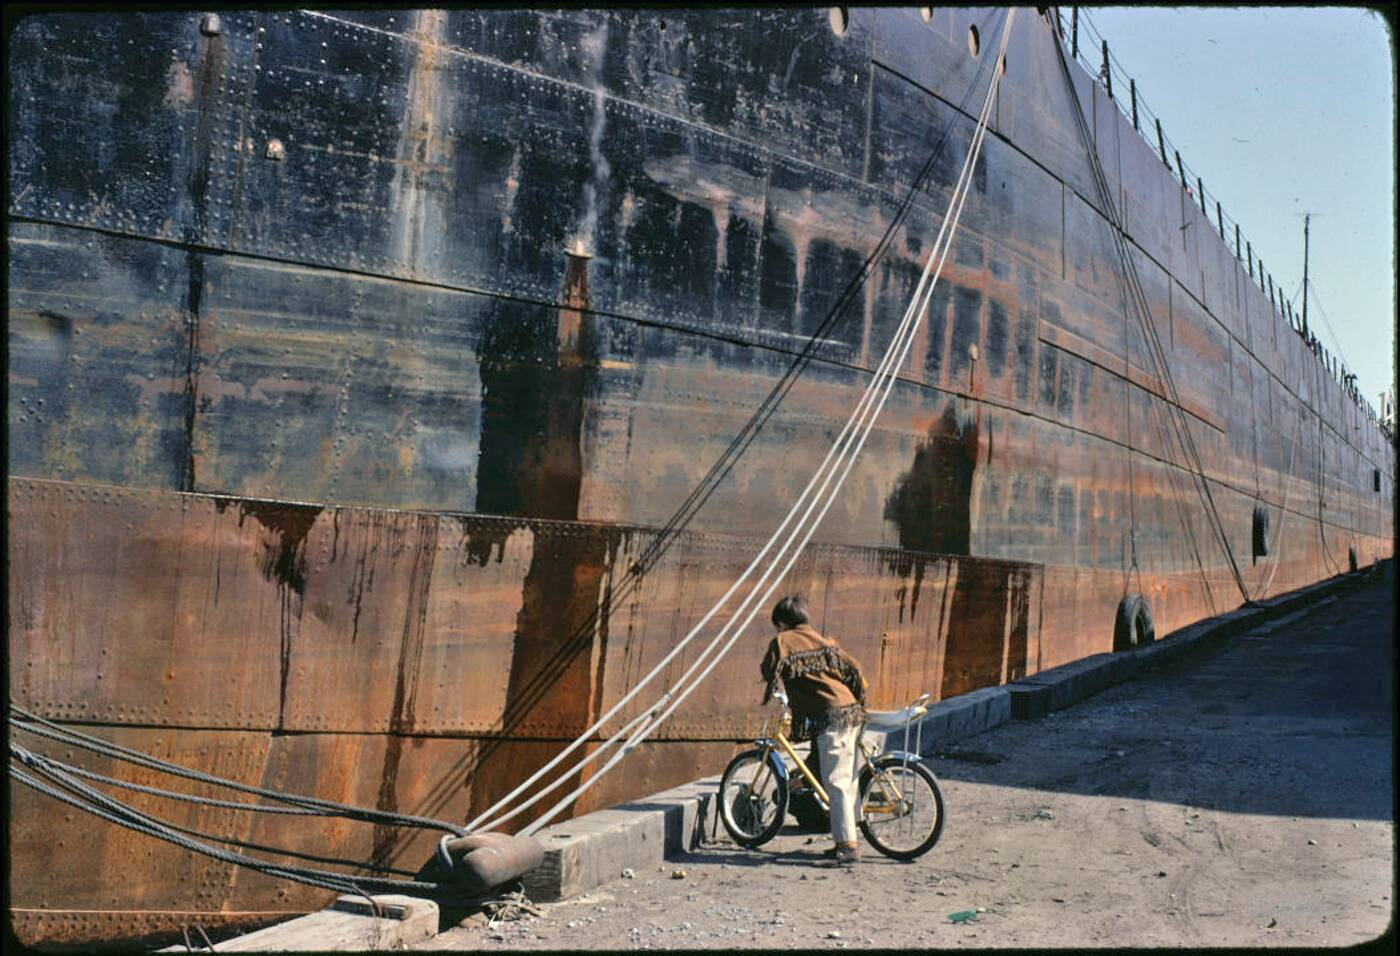 toronto waterfront 1970s